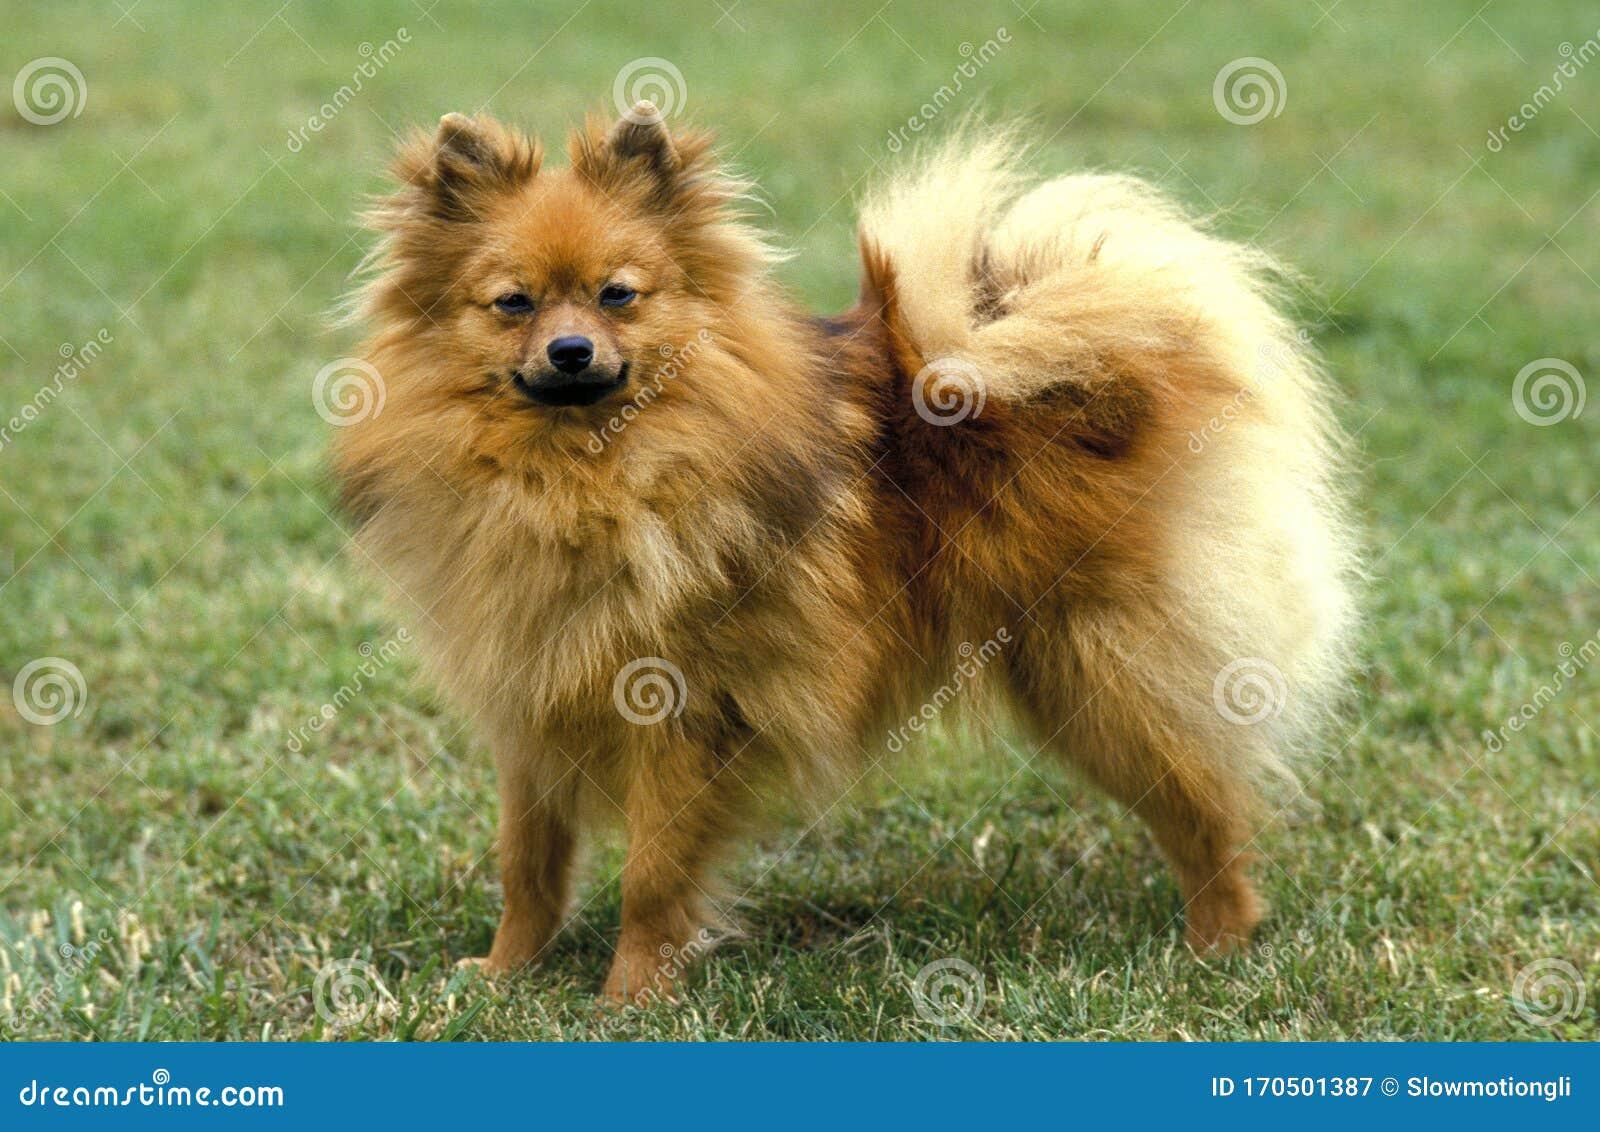 Spitz Nain Stock Image Image Of Companion Animal Miniature 170501387